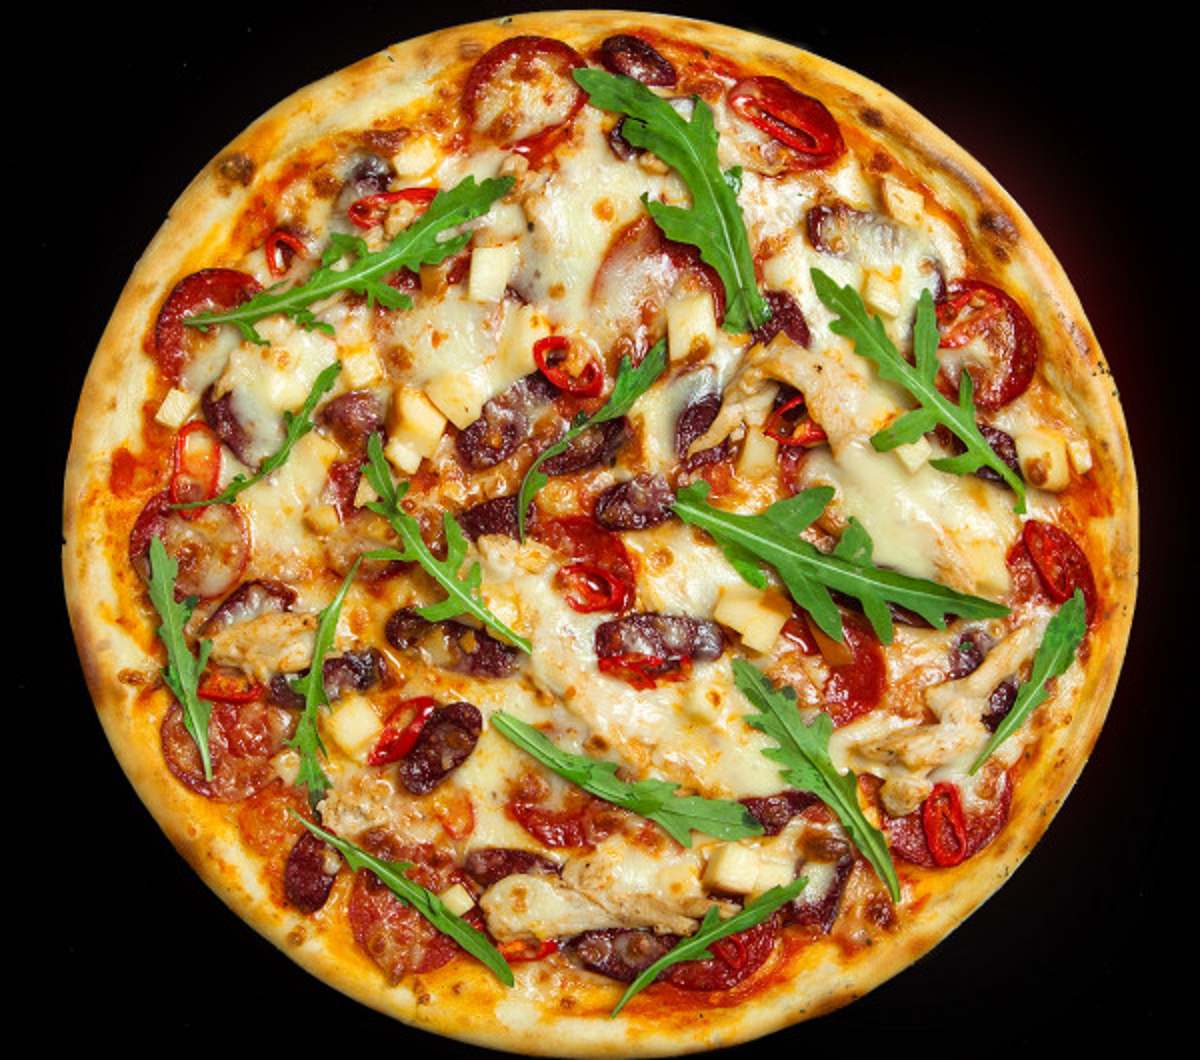 заказать: Пицца - Дьябло